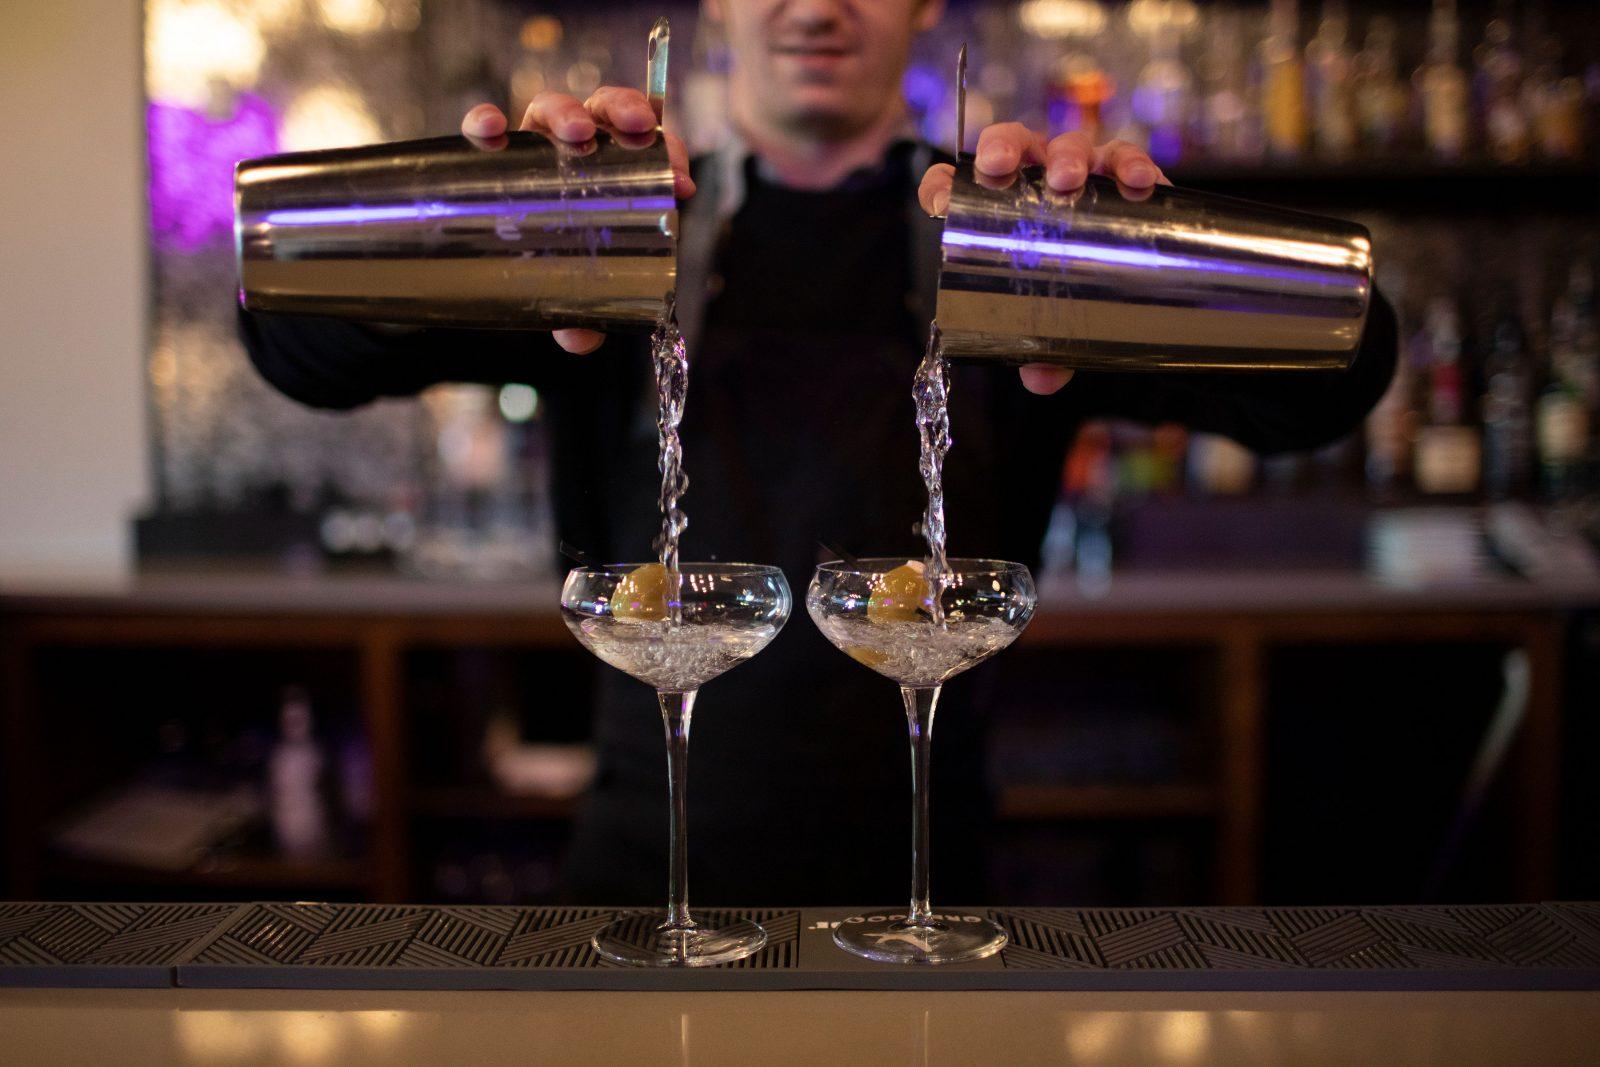 Mixed drinks at Happenstance Social Lounge, Nolensville TN